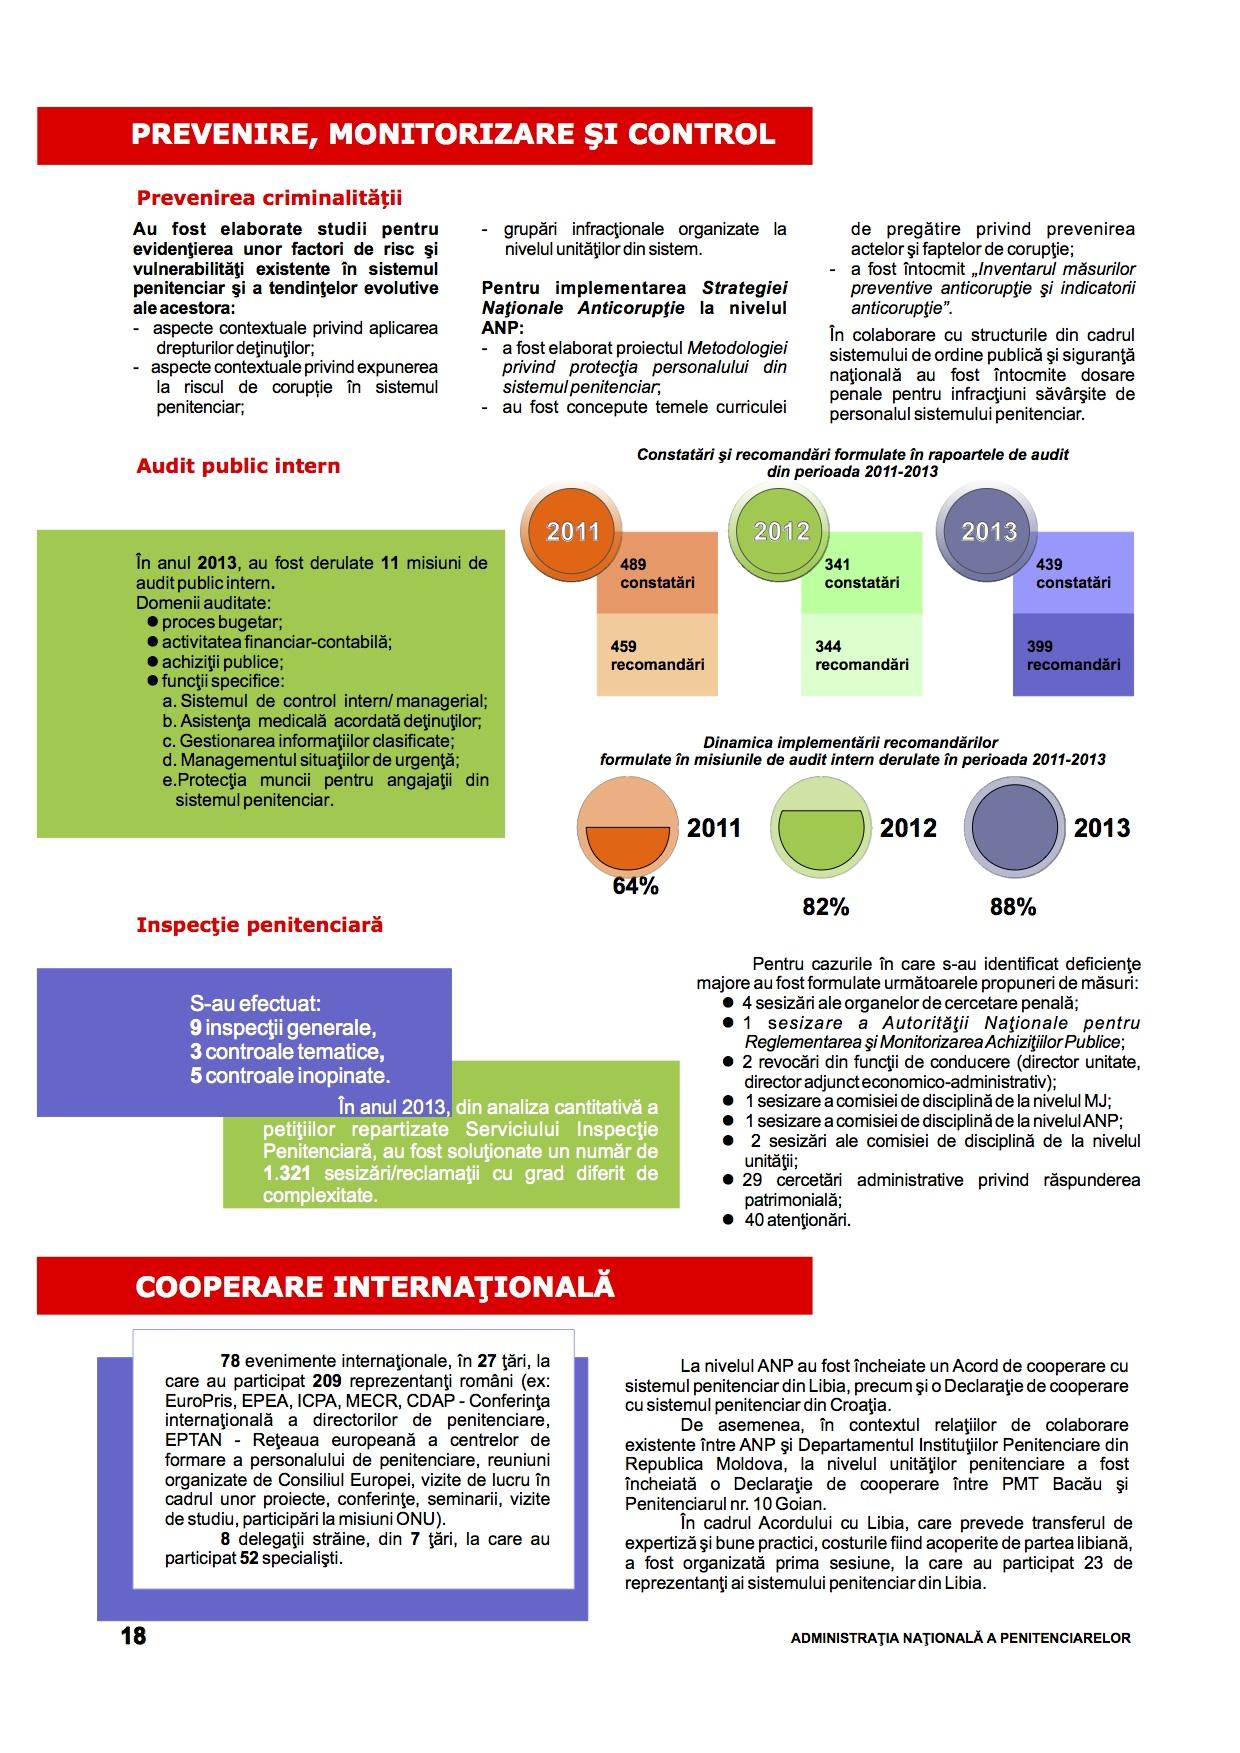 bilant 2013pg18